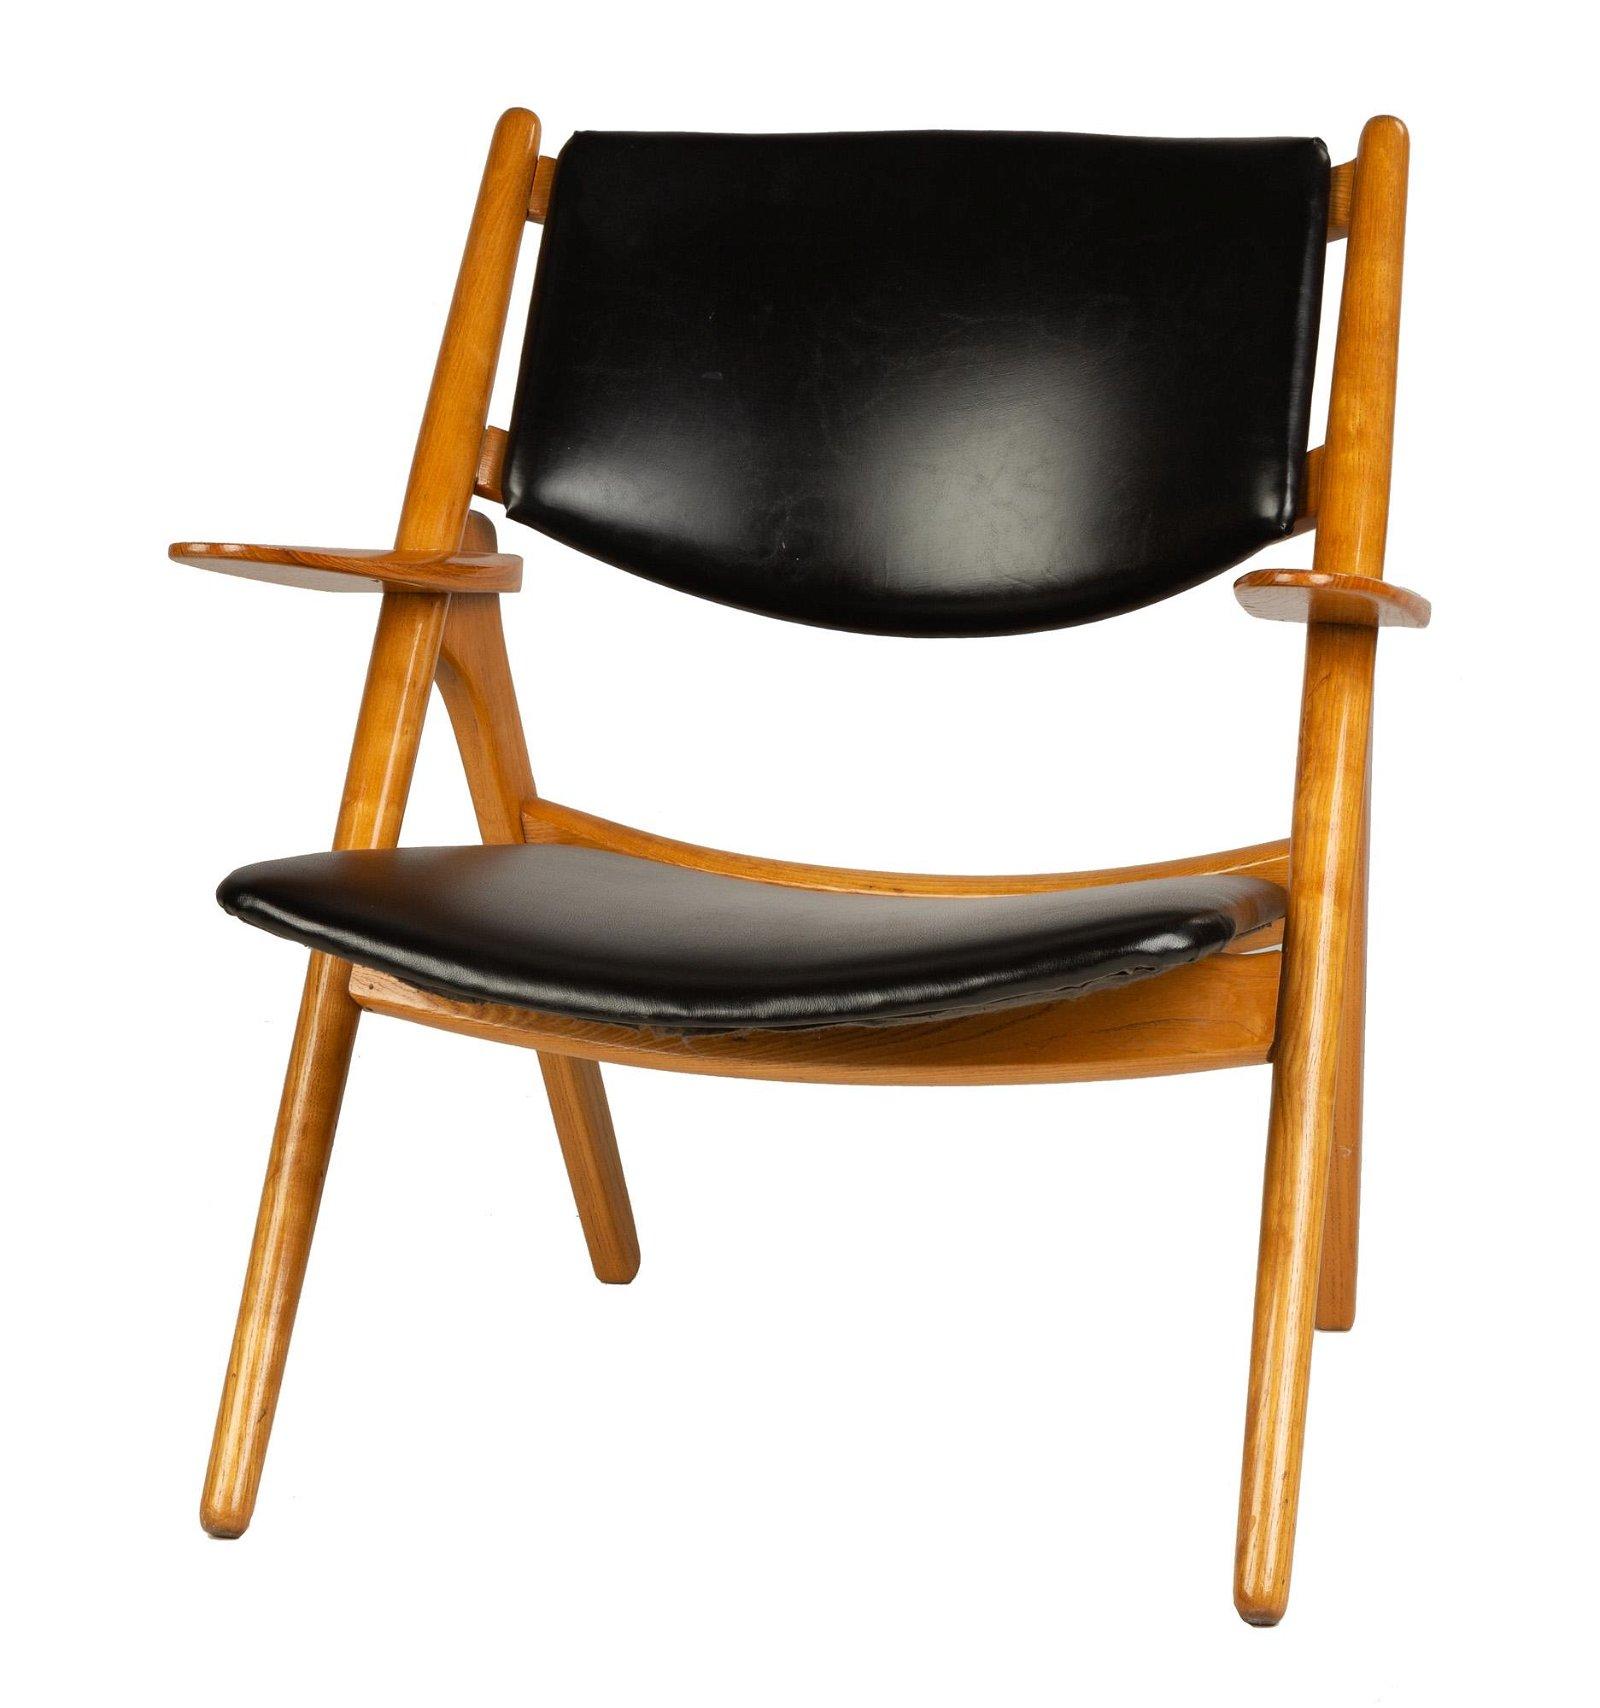 Hans J. Wegner (Danish, 1914-2007) The Sawback Chair